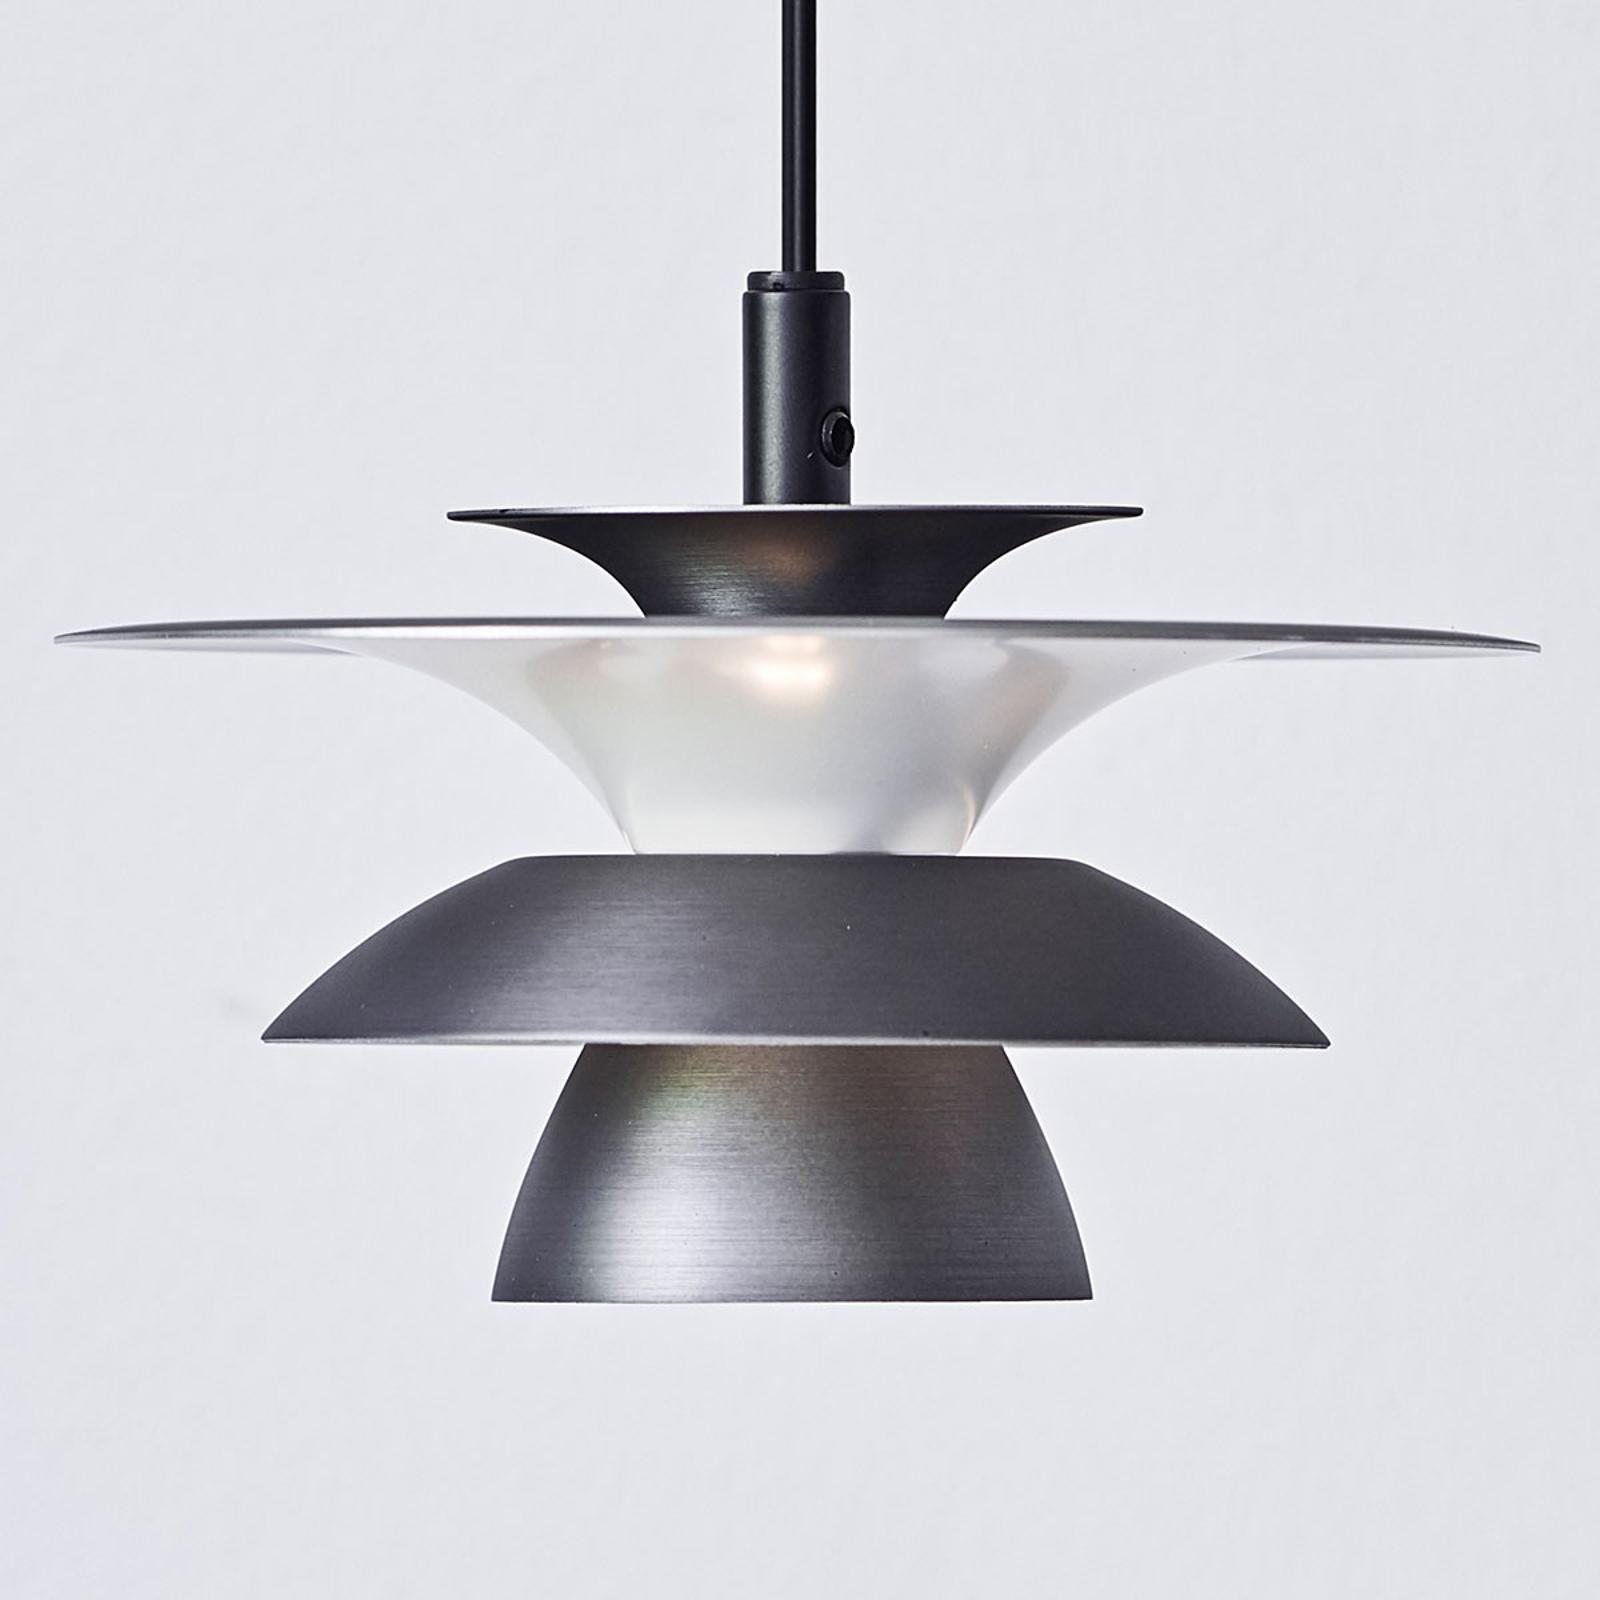 LED hanglamp Picasso 1-lamp, Ø 18 cm, oxide grijs